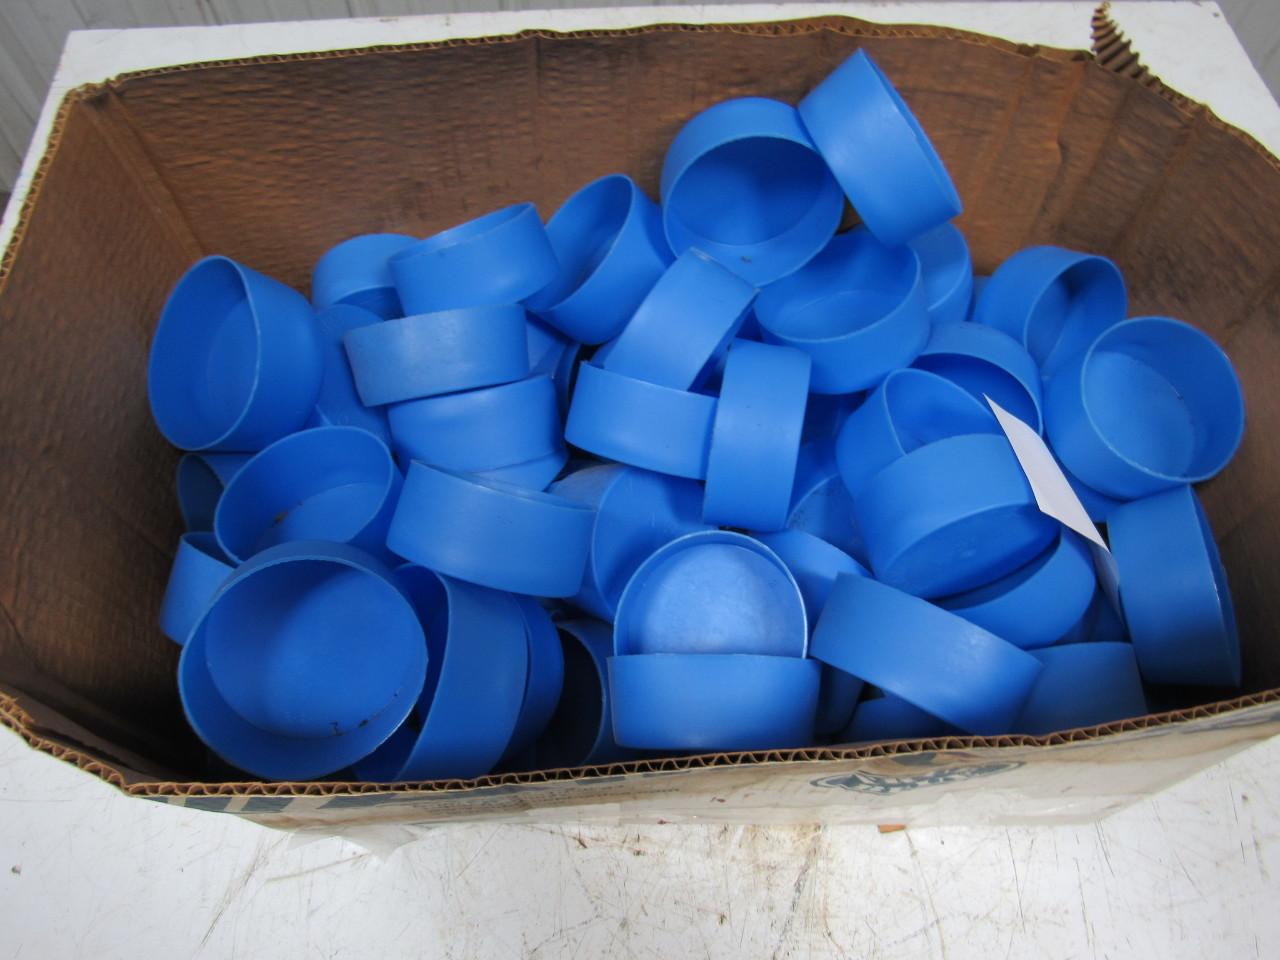 Alliance essentra quot push fit closed end pipe cap blue